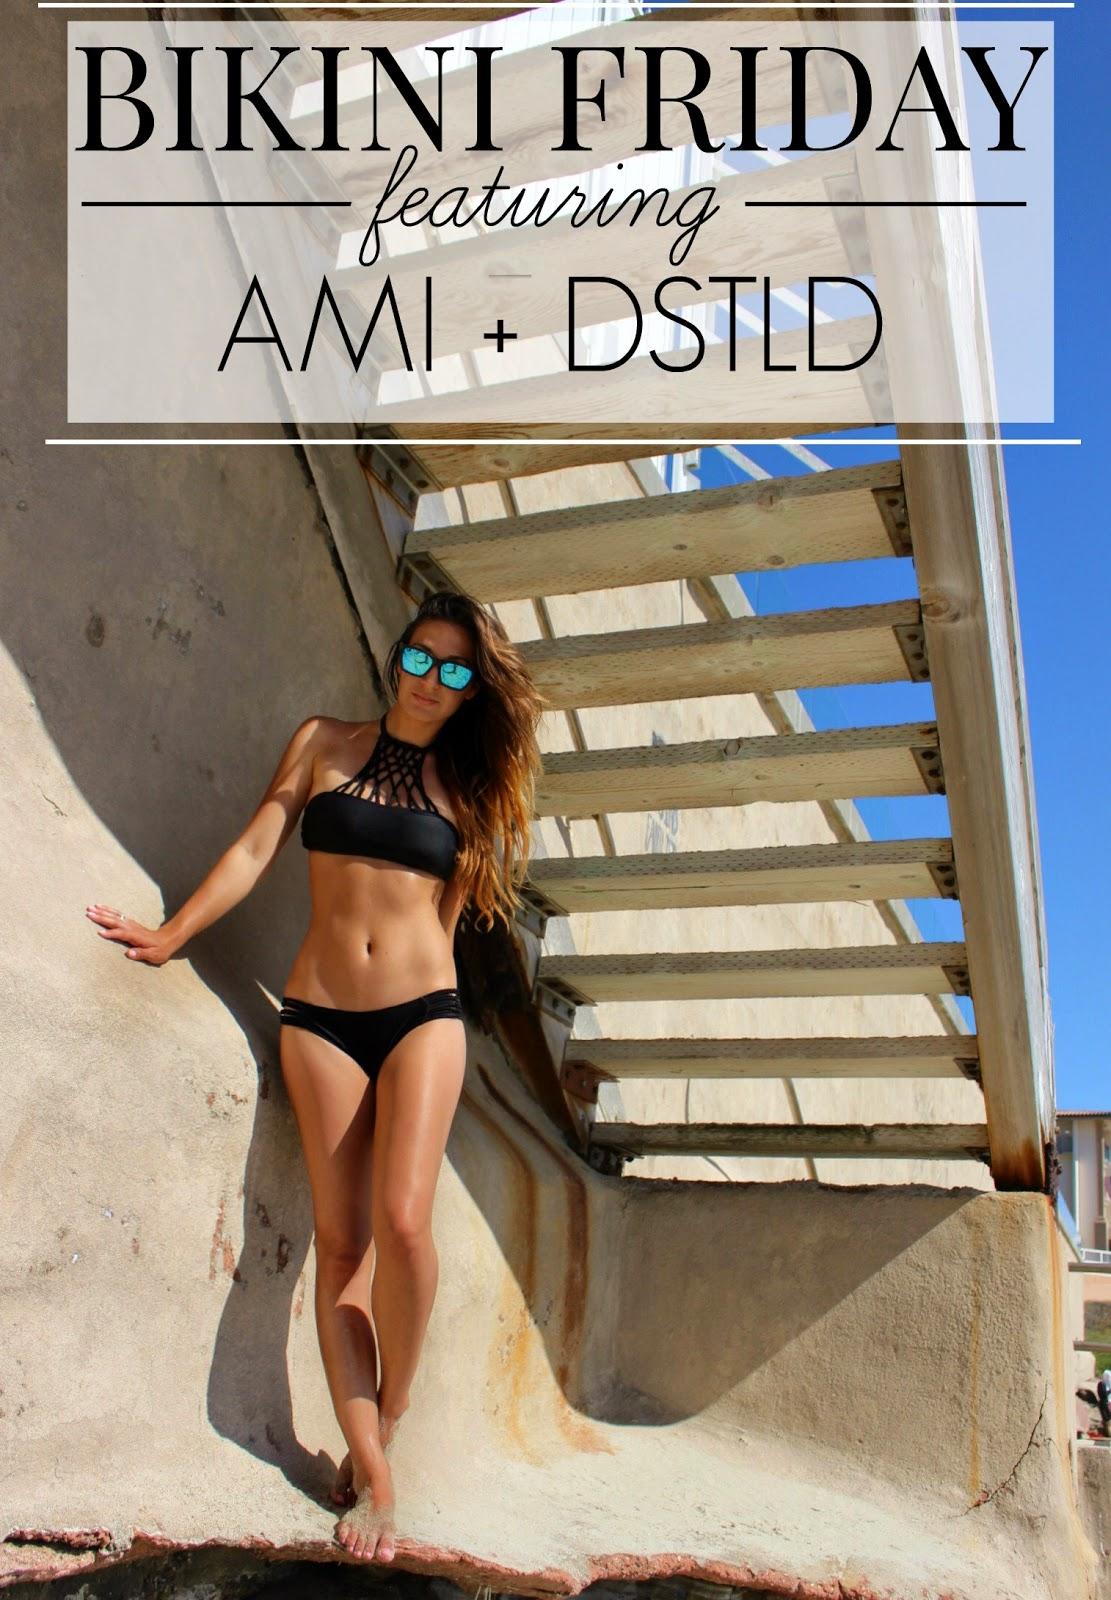 http://www.mepoopsie.com/2014/08/bikini-friday-ami-dstld.html